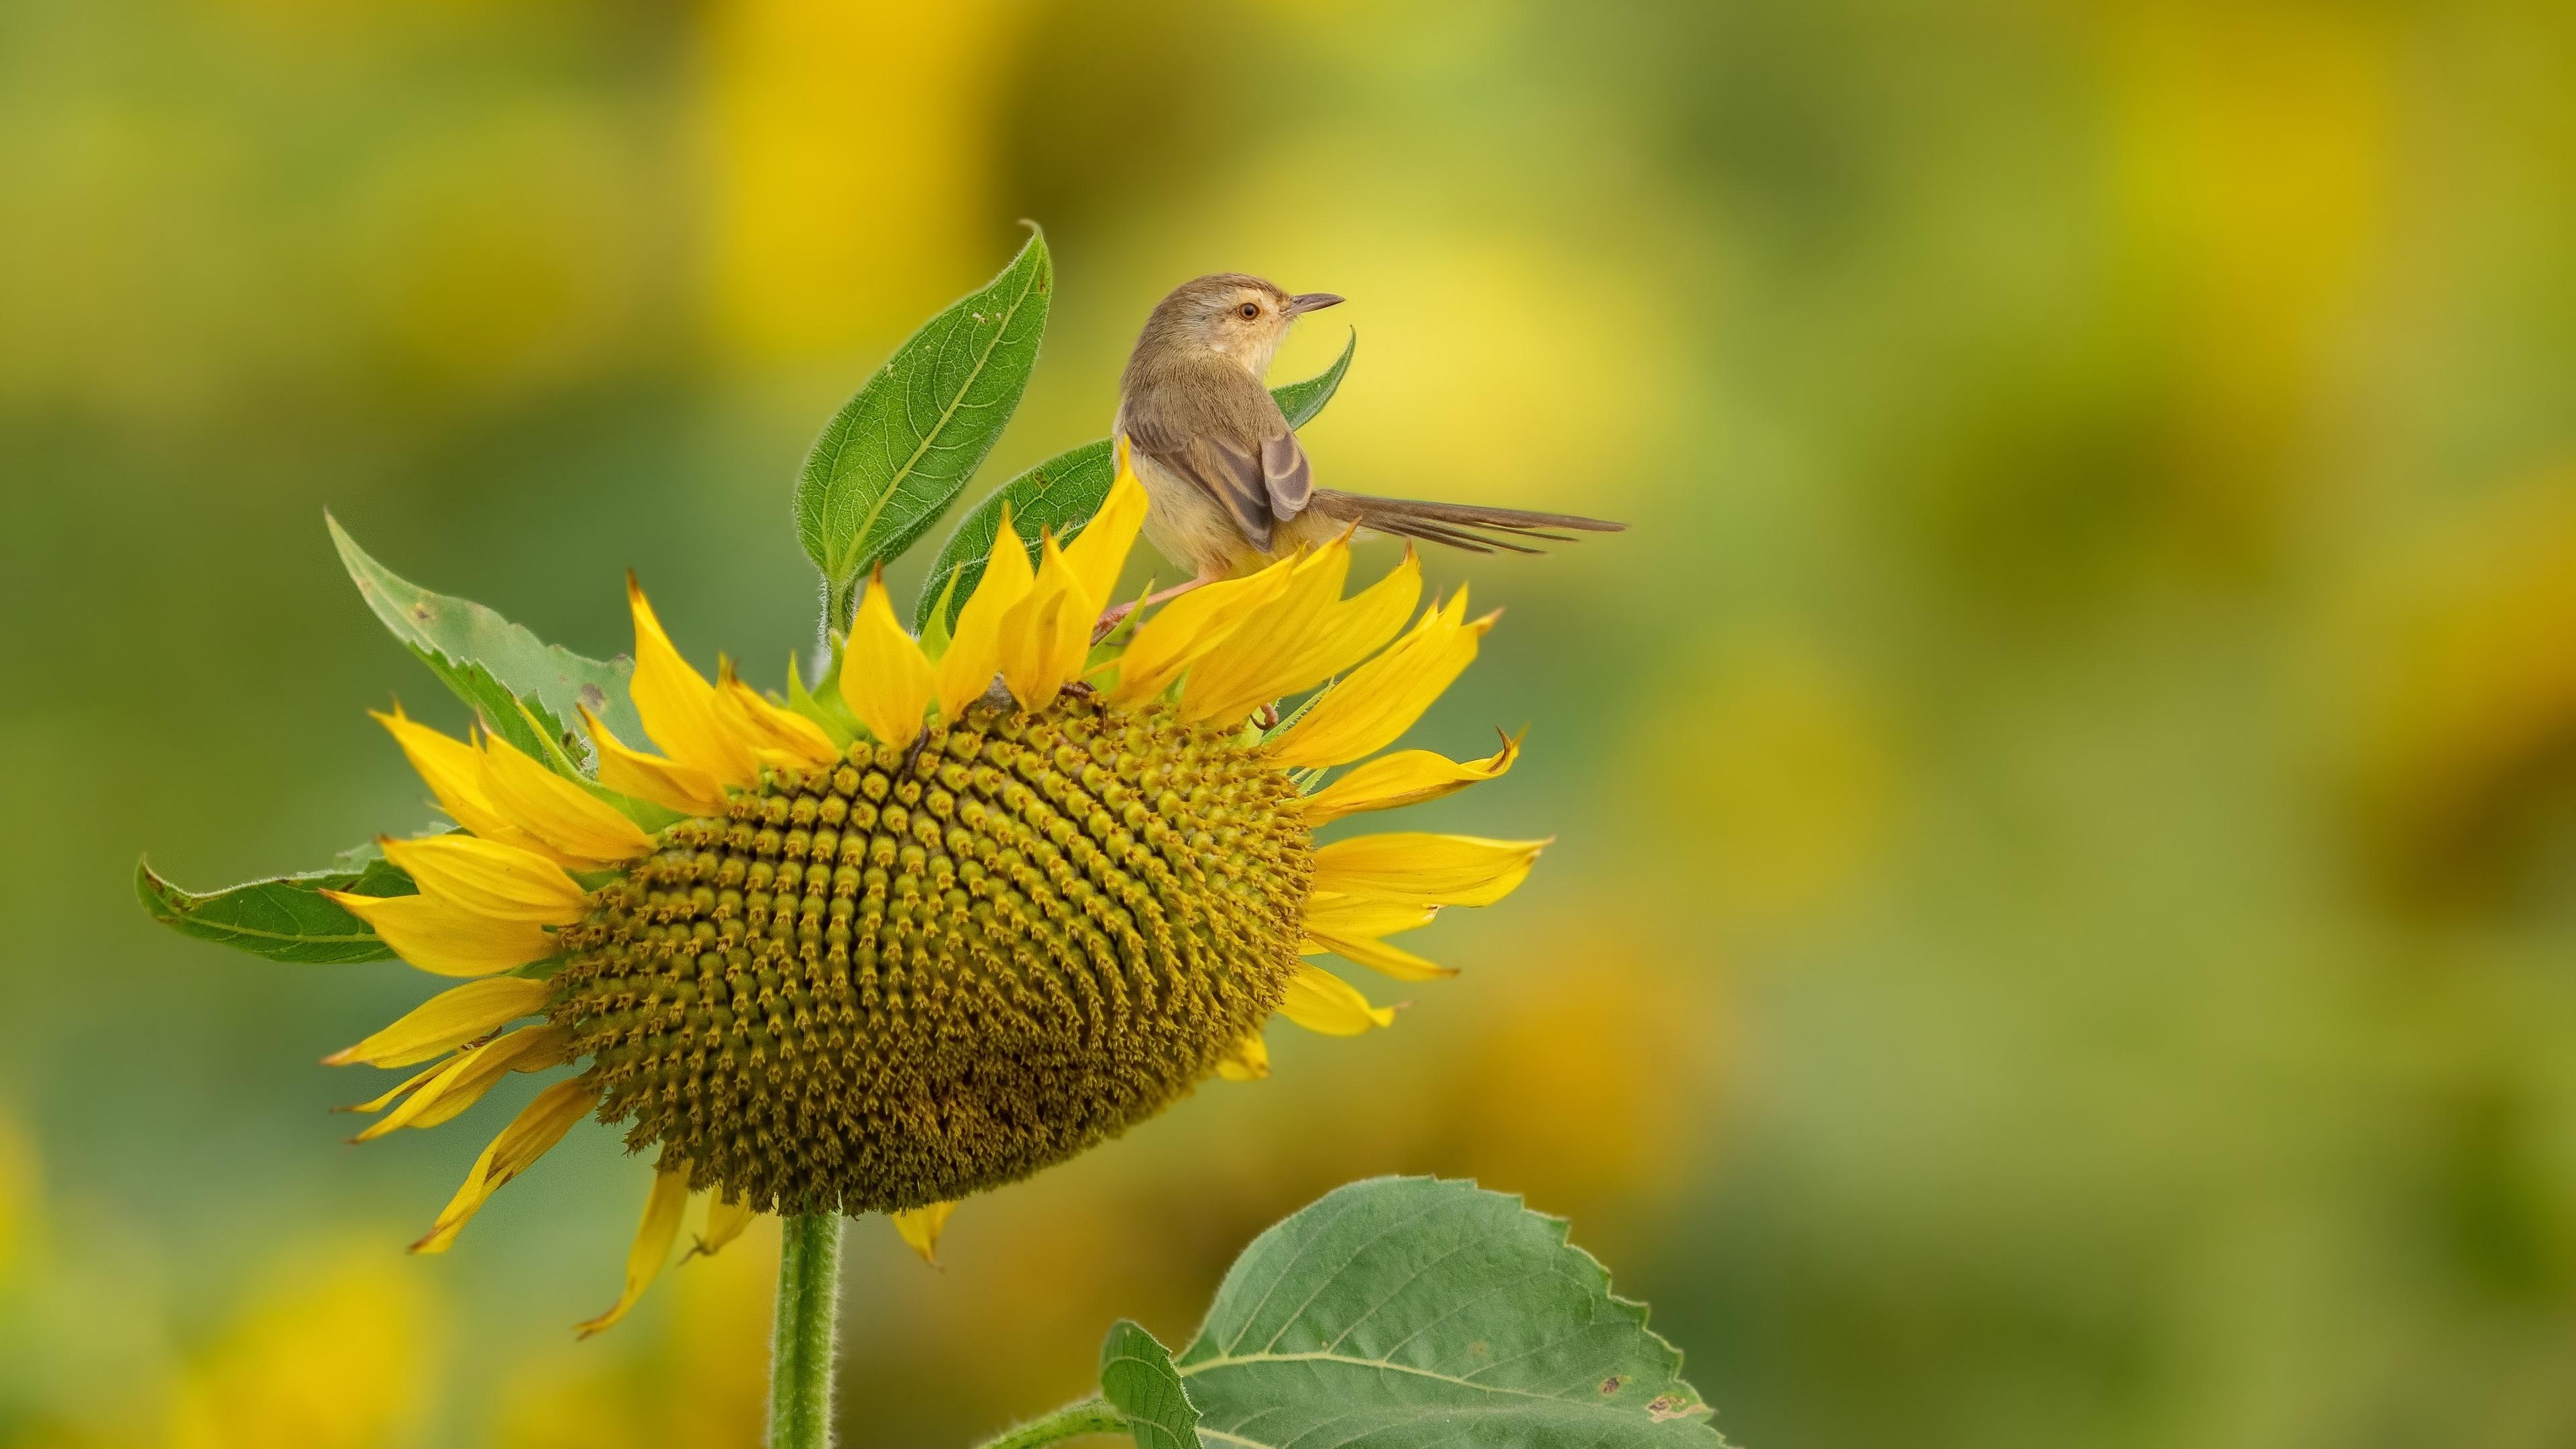 Sunflower Yellow Flower Wildlife 3840x2160